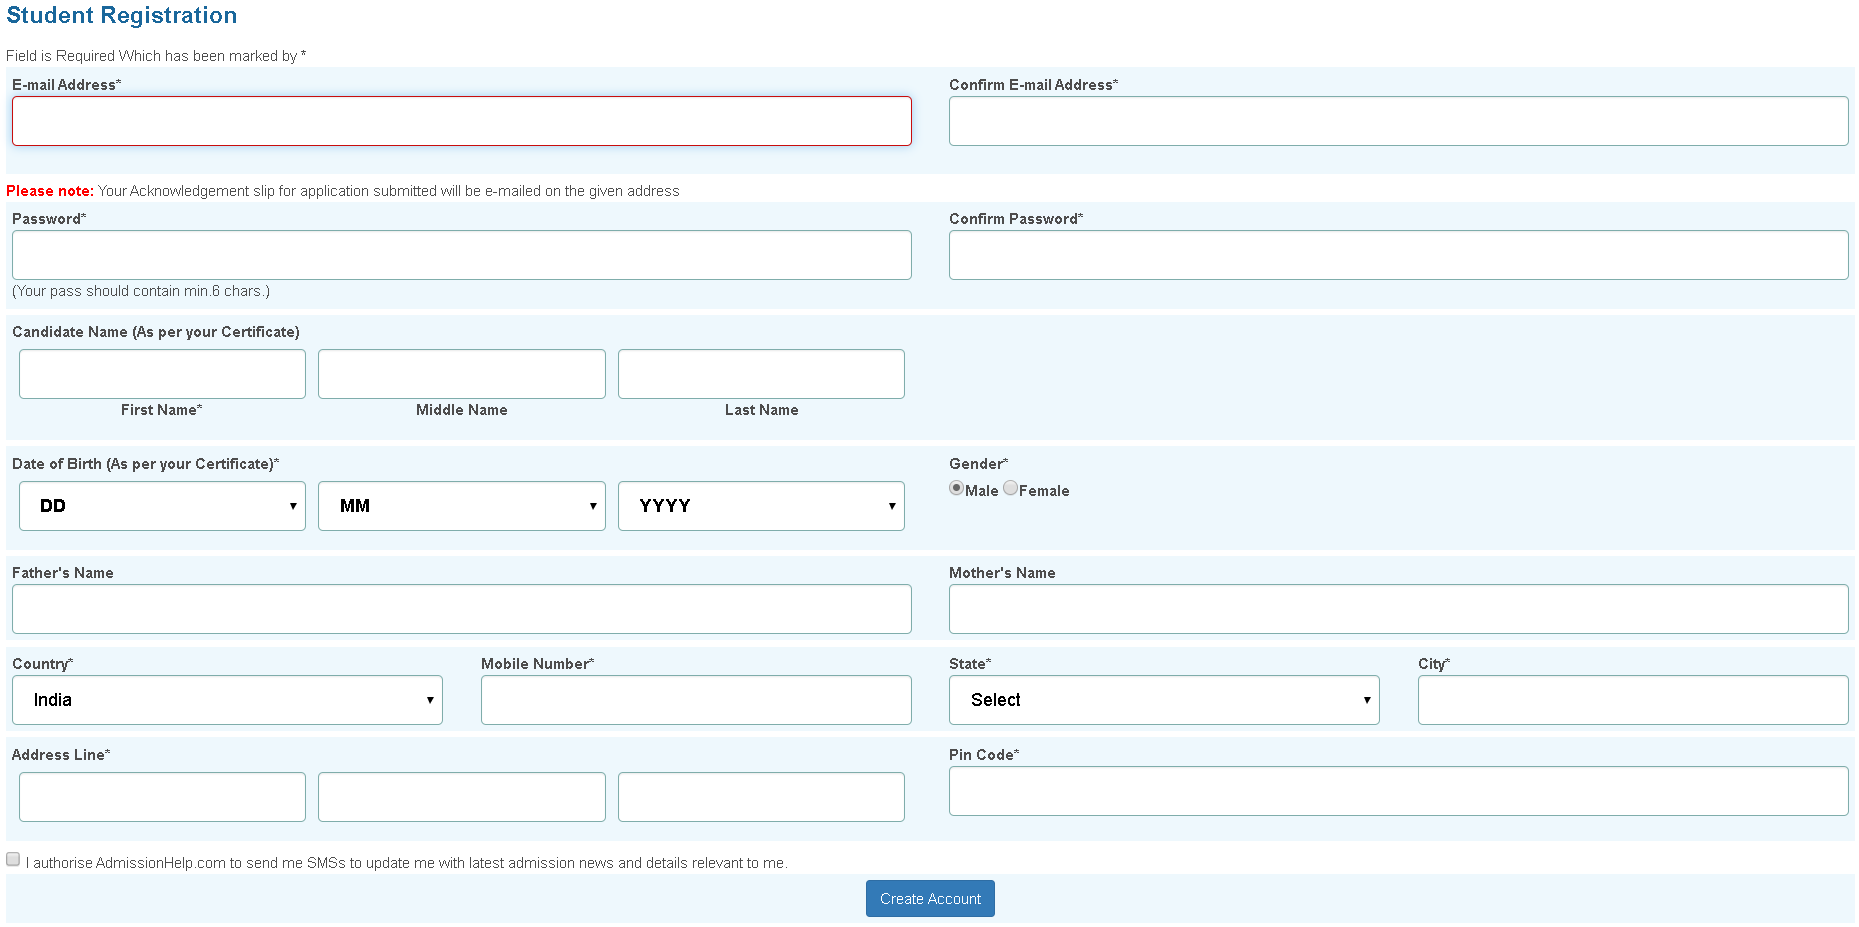 AILET Application Form Student Registration